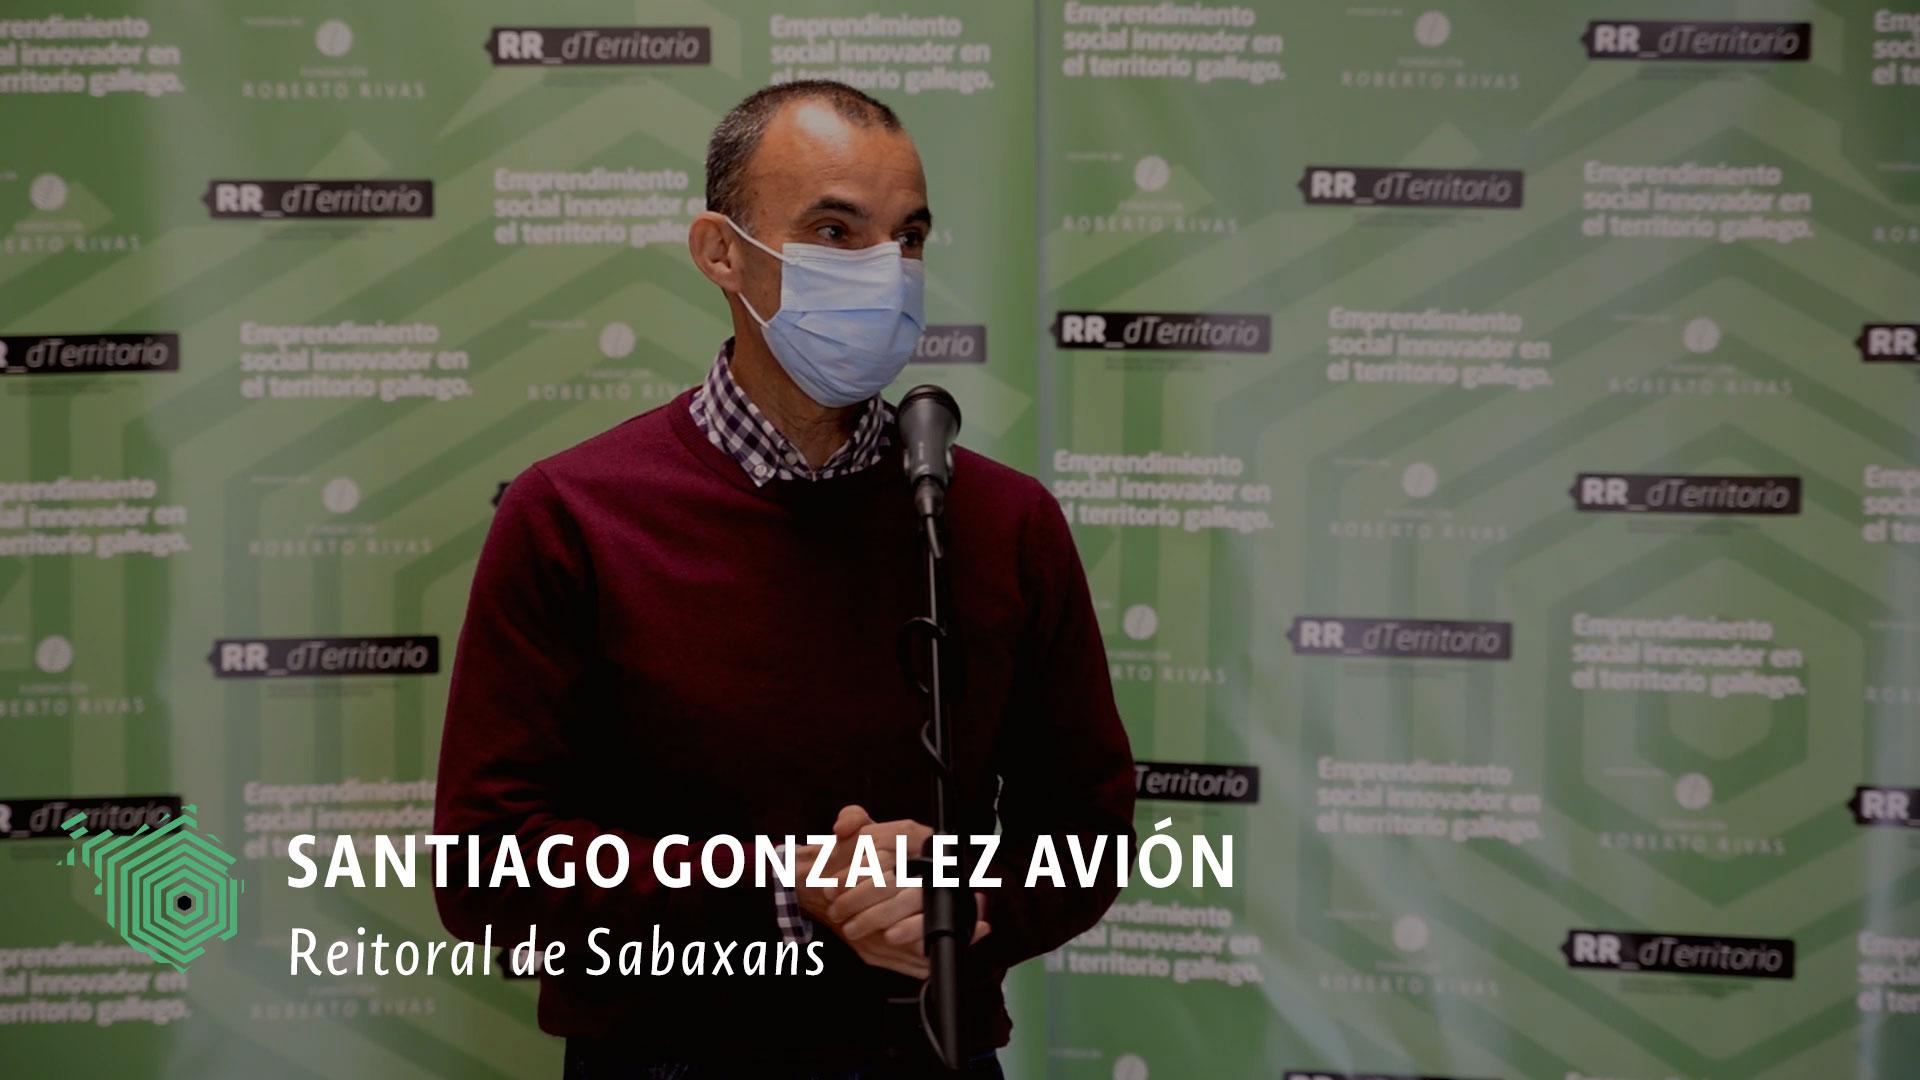 Reitoral de Sabaxáns de Santiago González